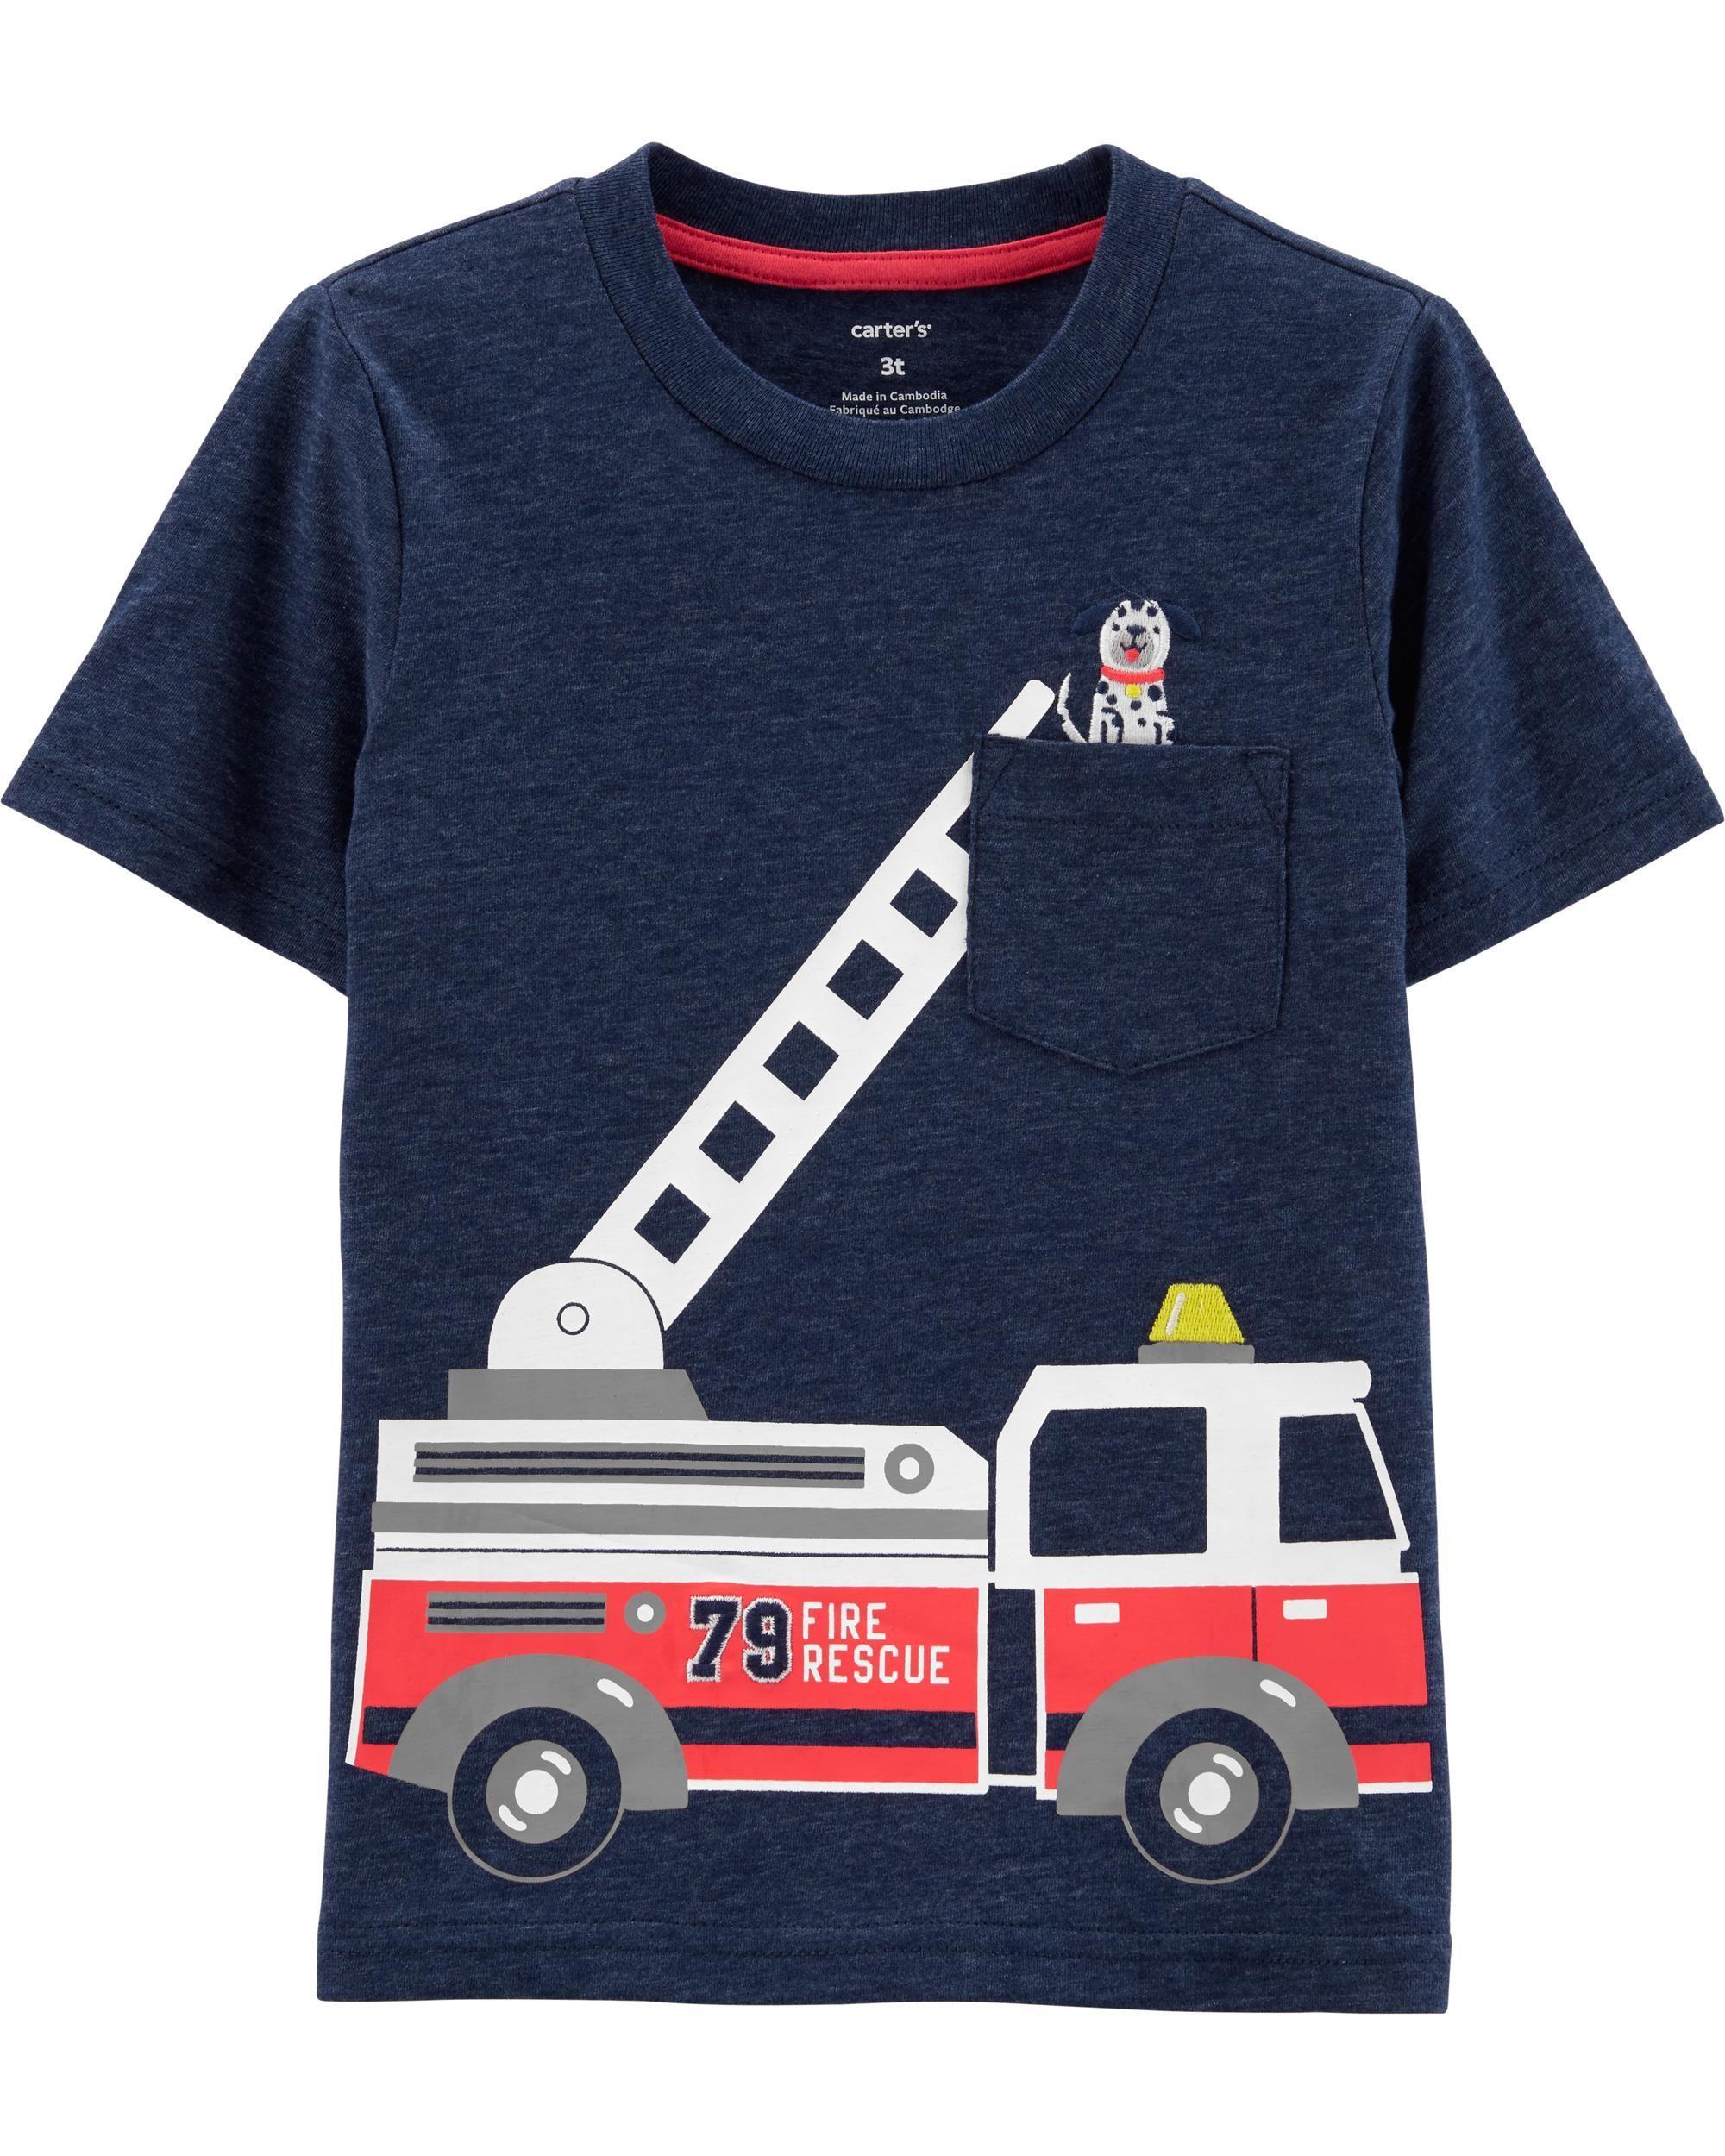 397af1670 Firetruck Snow Yarn Tee in 2019 | Nephew gift | Toddler boys, Baby ...